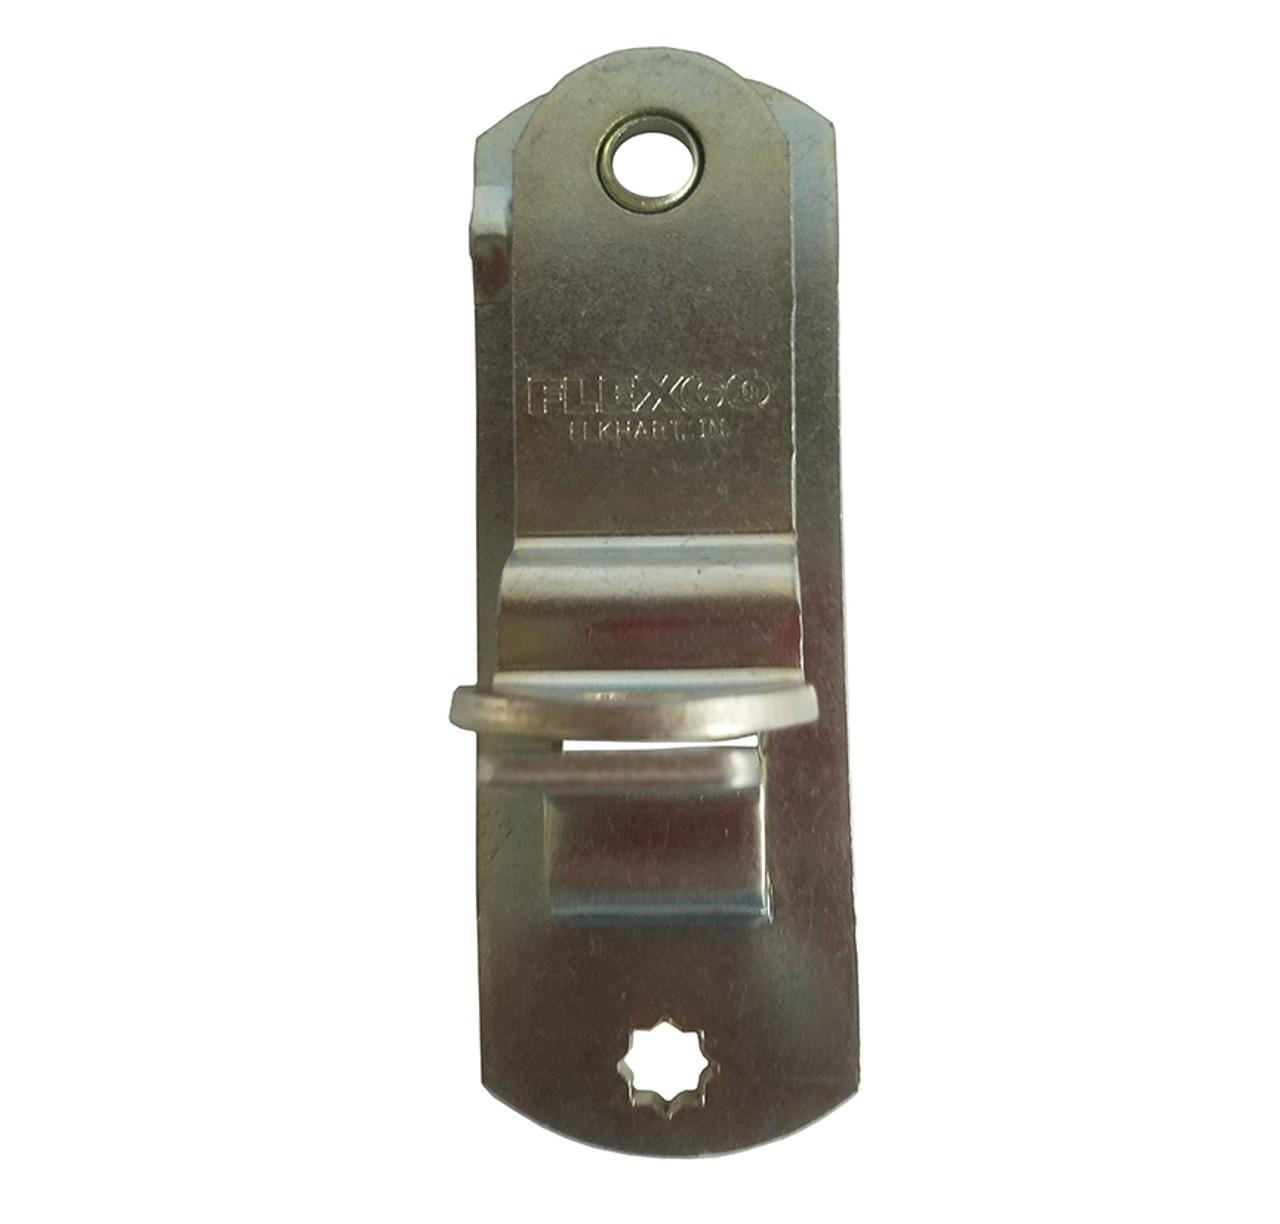 HMHASP --- Cam Door Lock Hasp